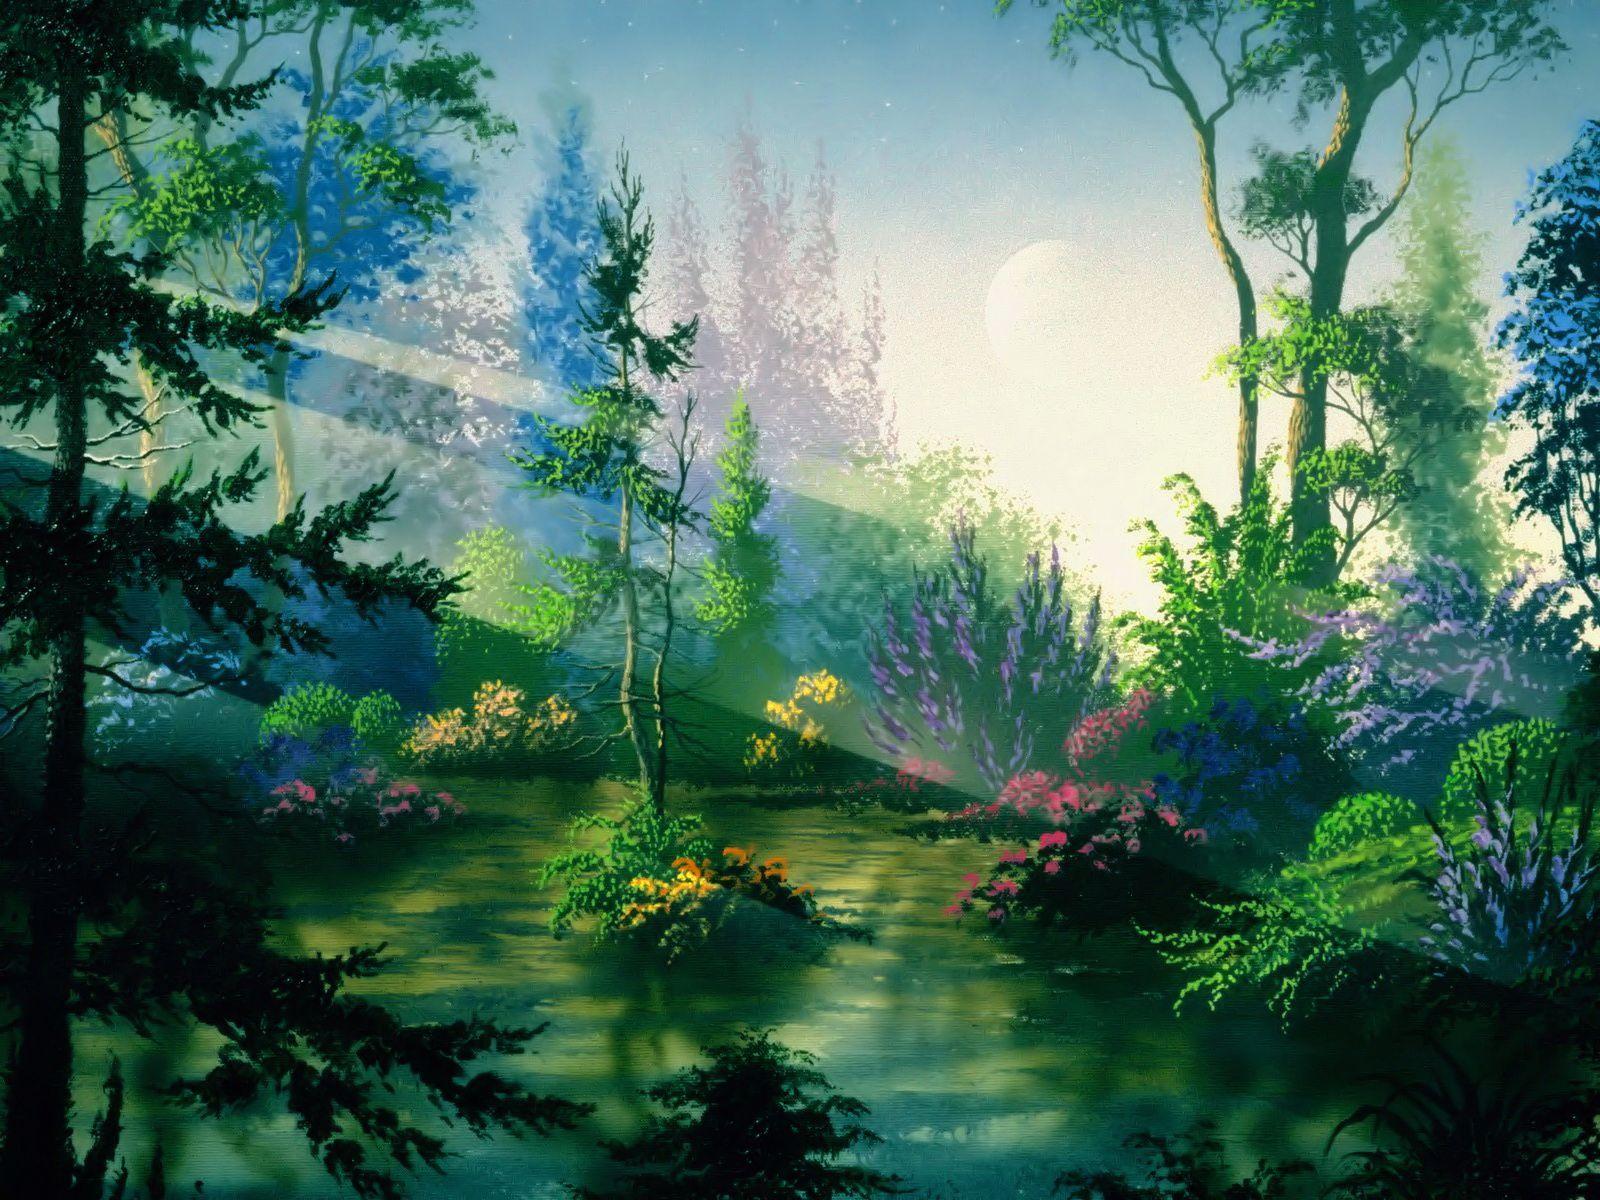 Fantasy Photo Fantasy Forest Scenery Wallpaper Fantasy Forest Fantasy Landscape